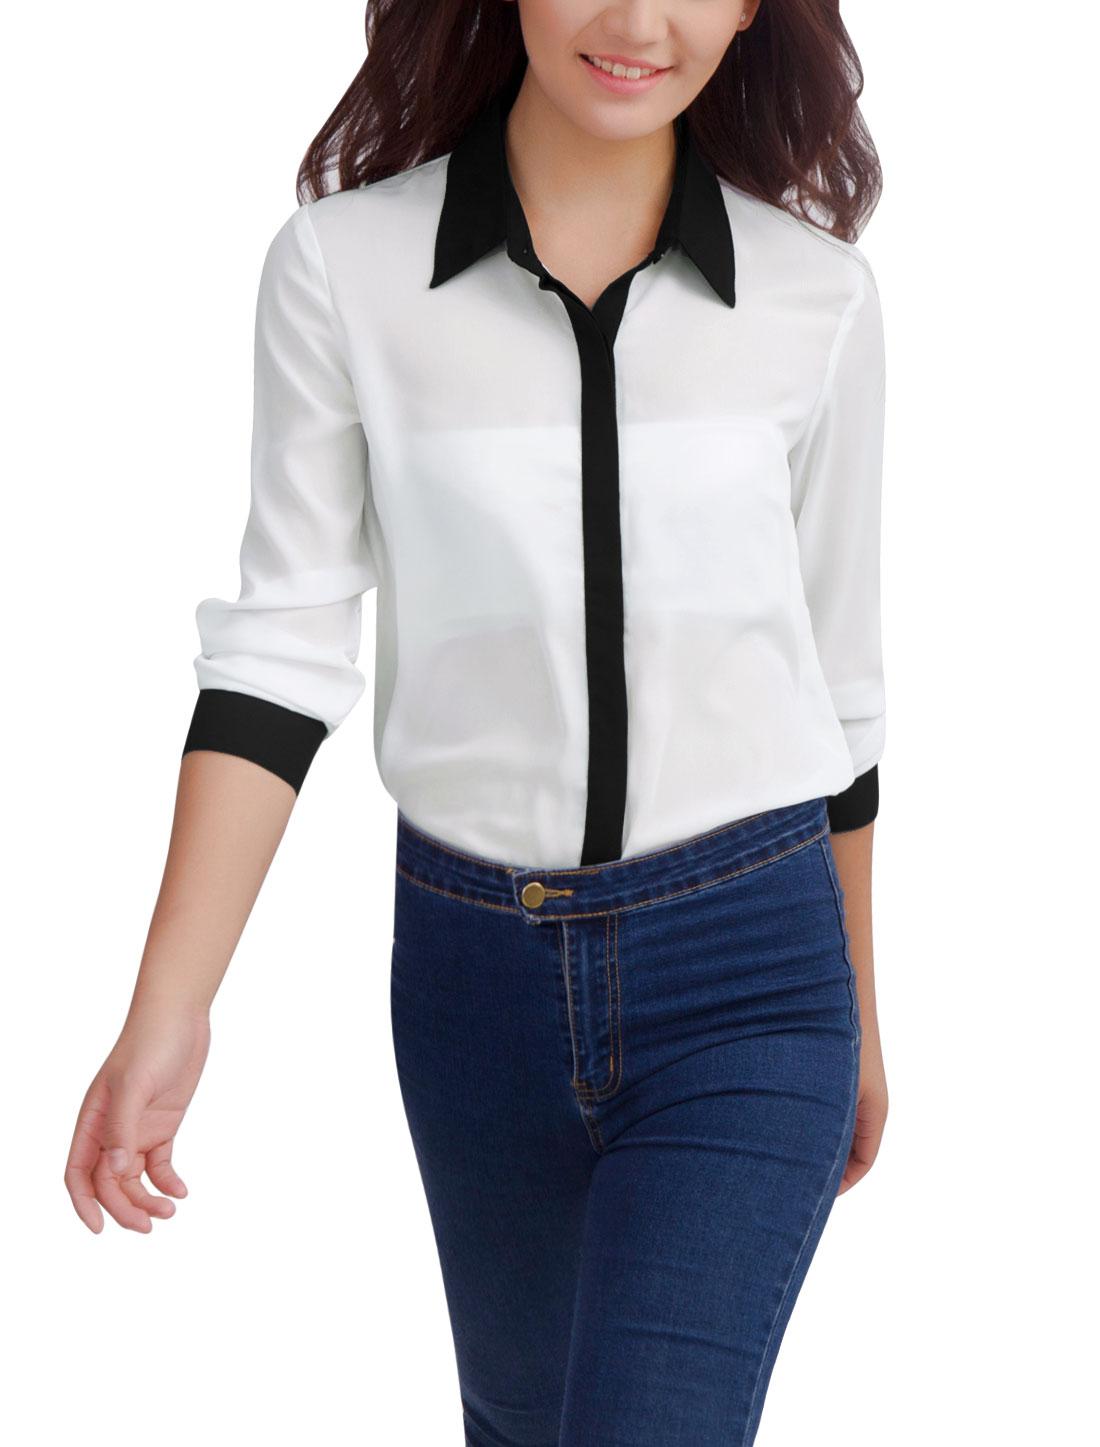 Woman Chic Contrast Color Irregular Hem Design White Blouse XL